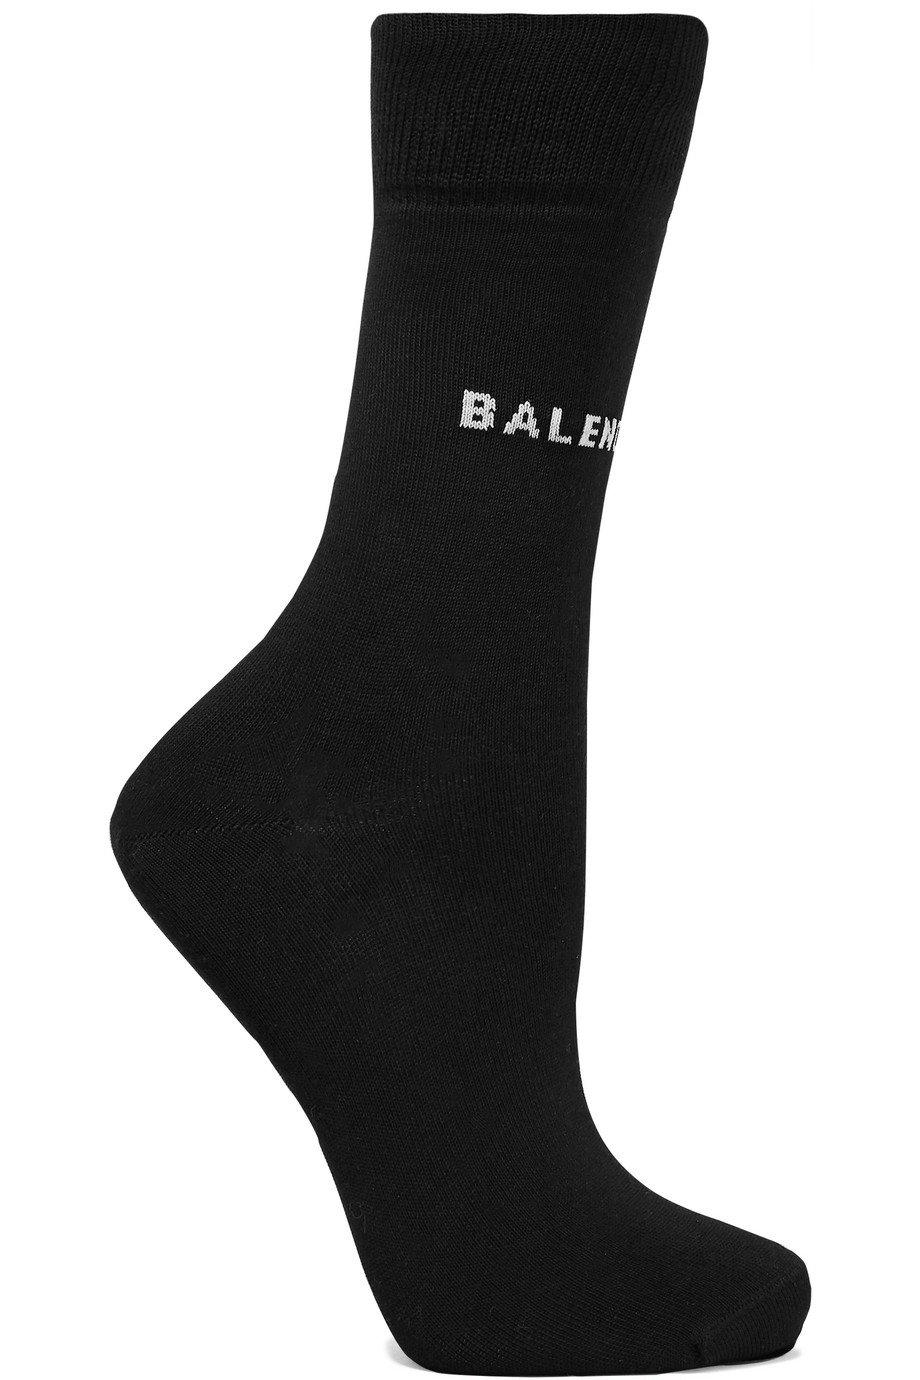 Balenciaga   Intarsia cotton-blend socks   NET-A-PORTER.COM